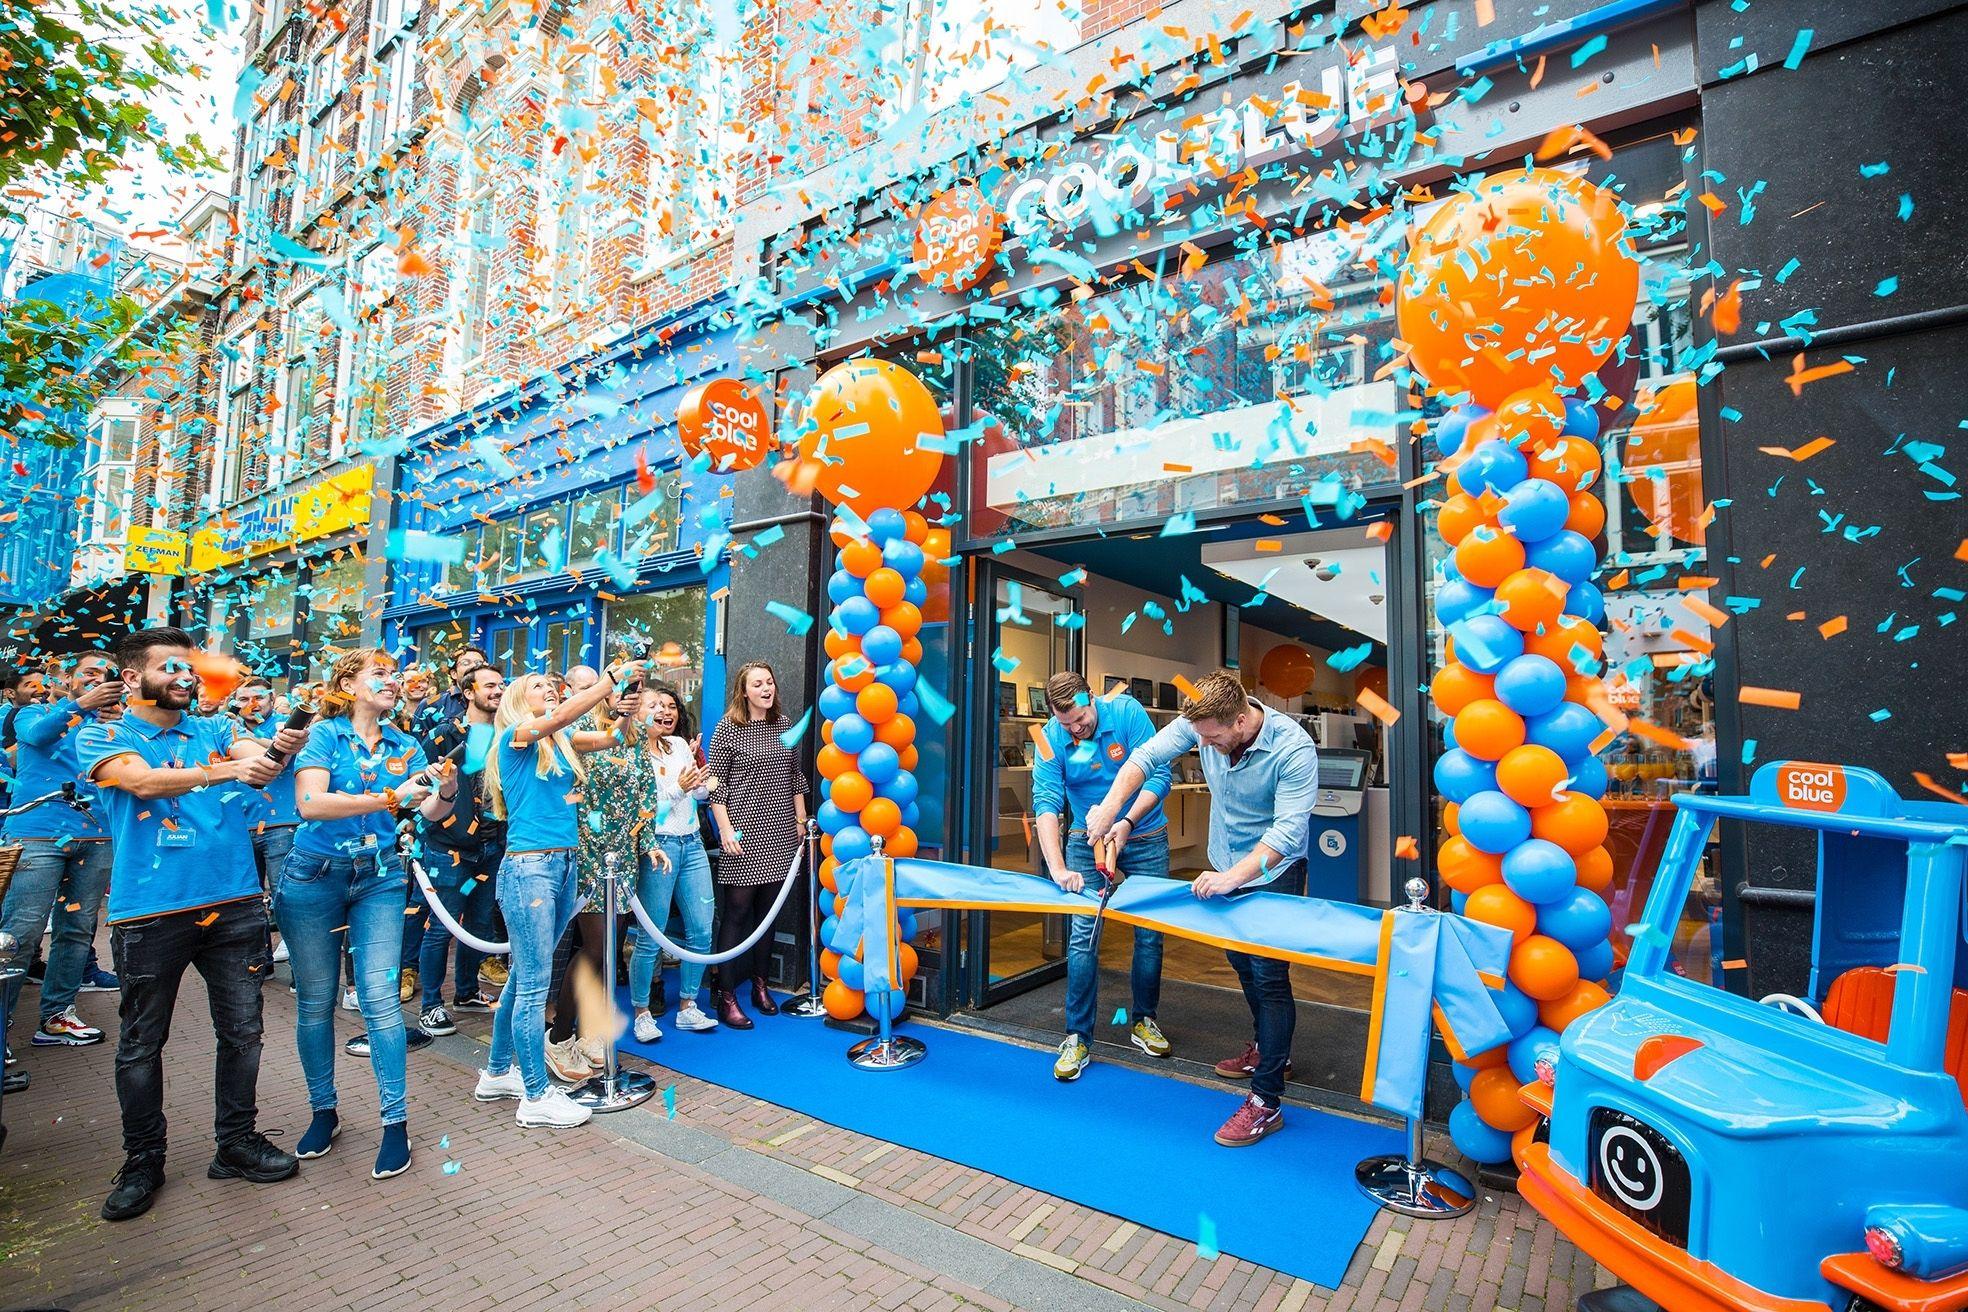 Winkelstraat online Coolblue bricks clicks